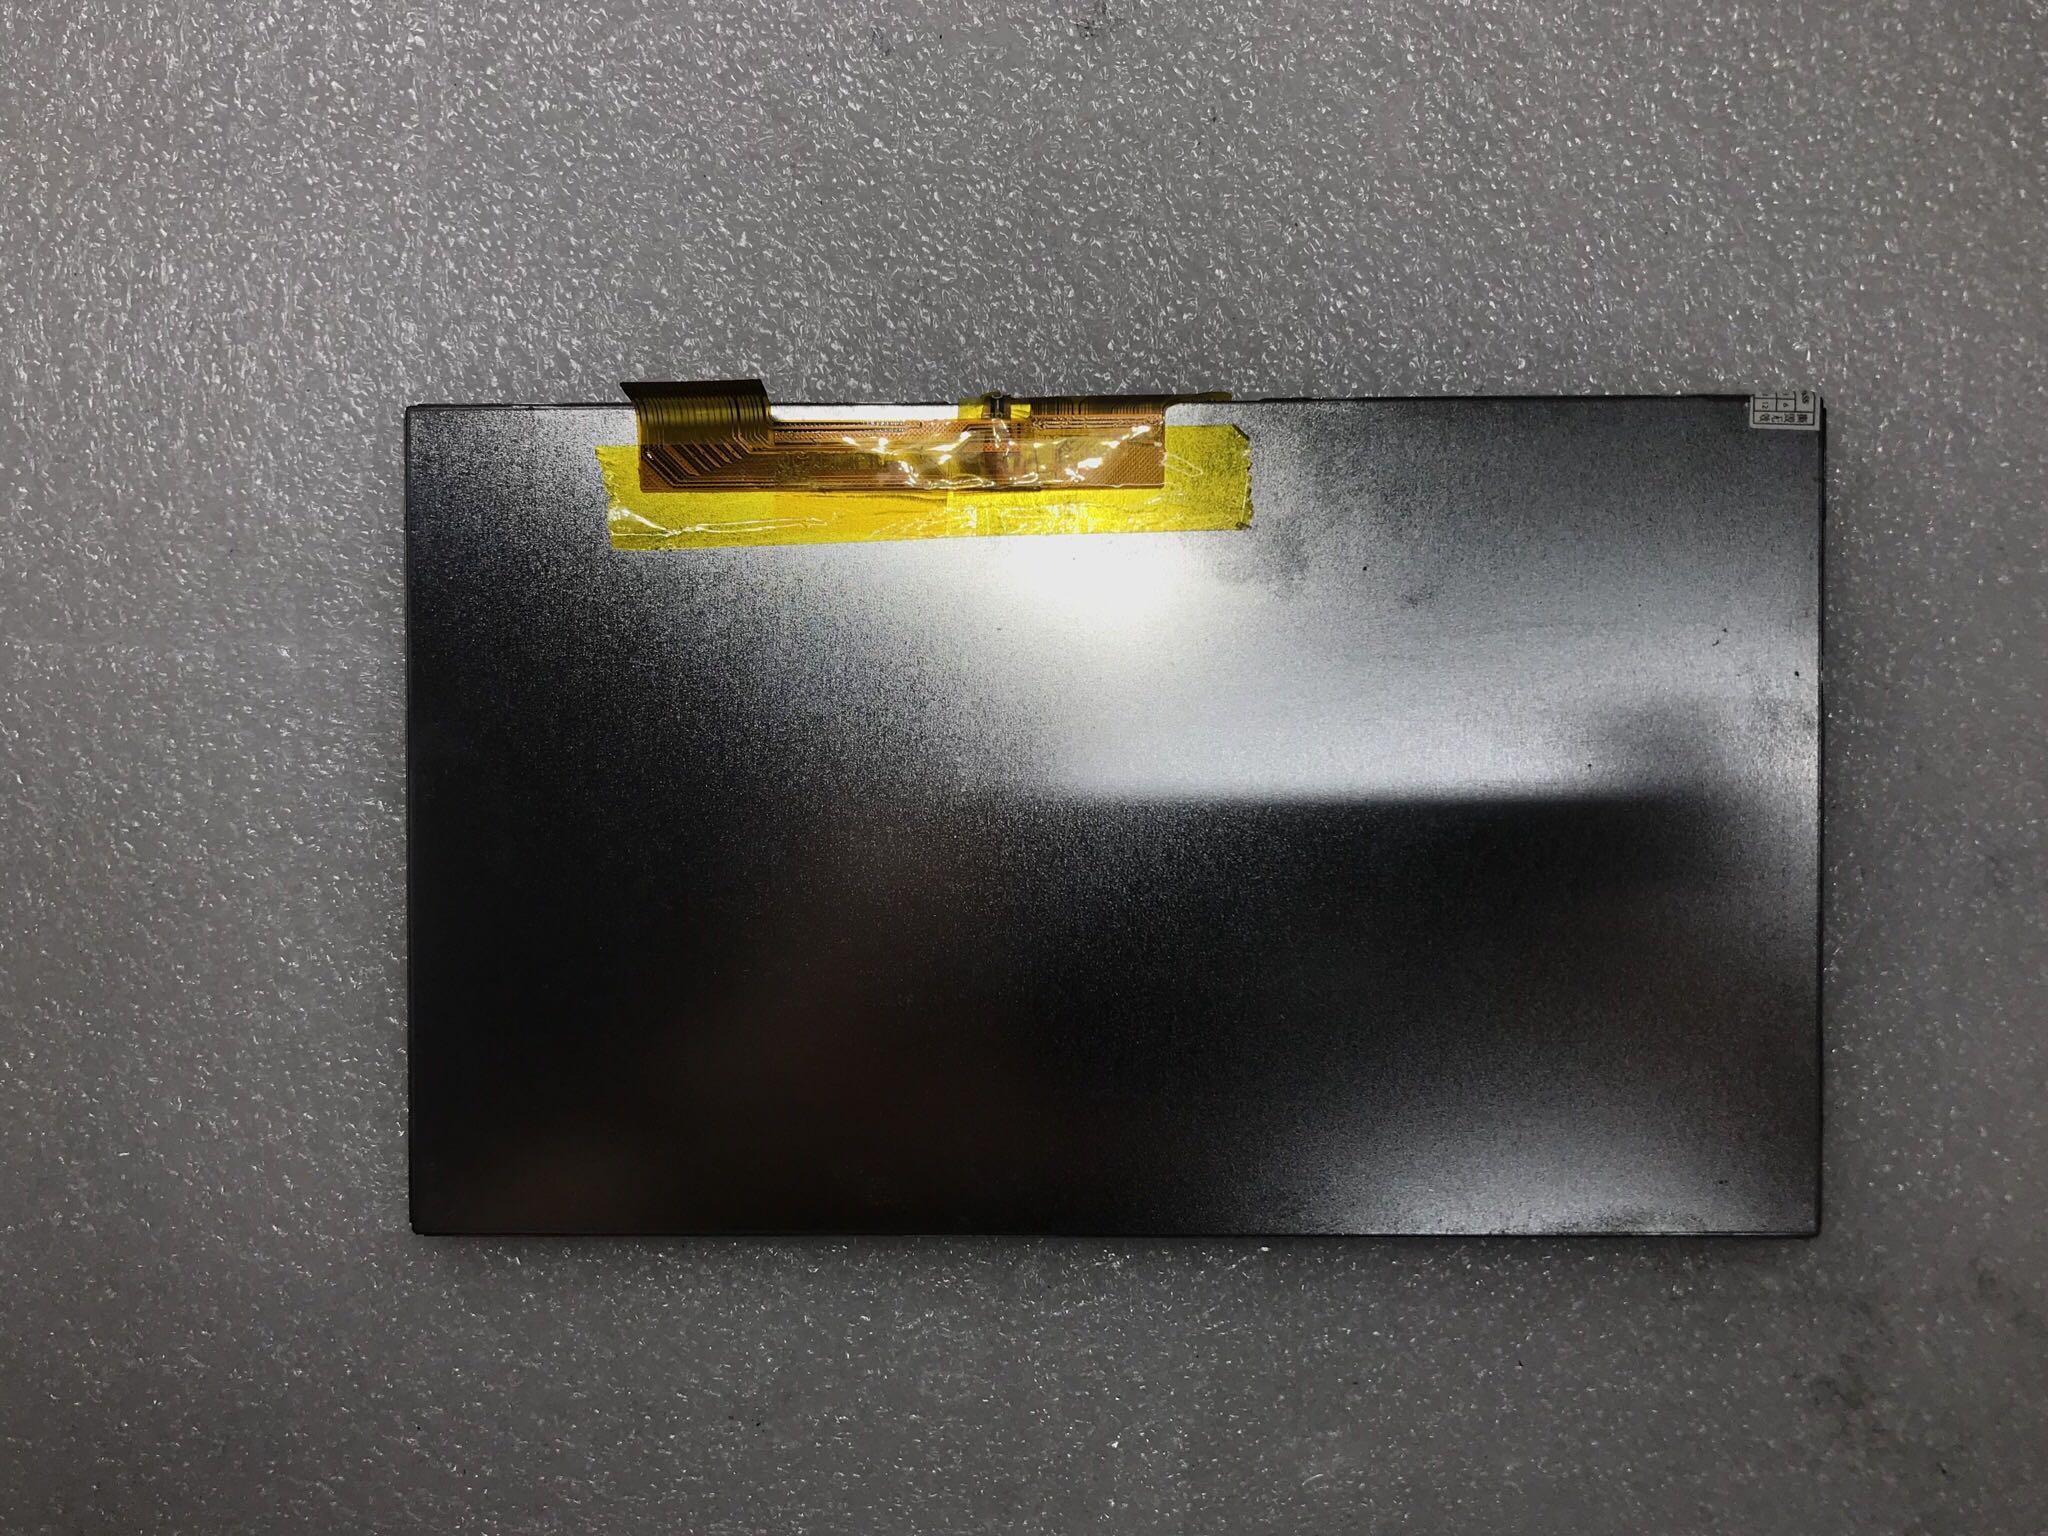 شاشة عرض LCD QC7DMIPIU